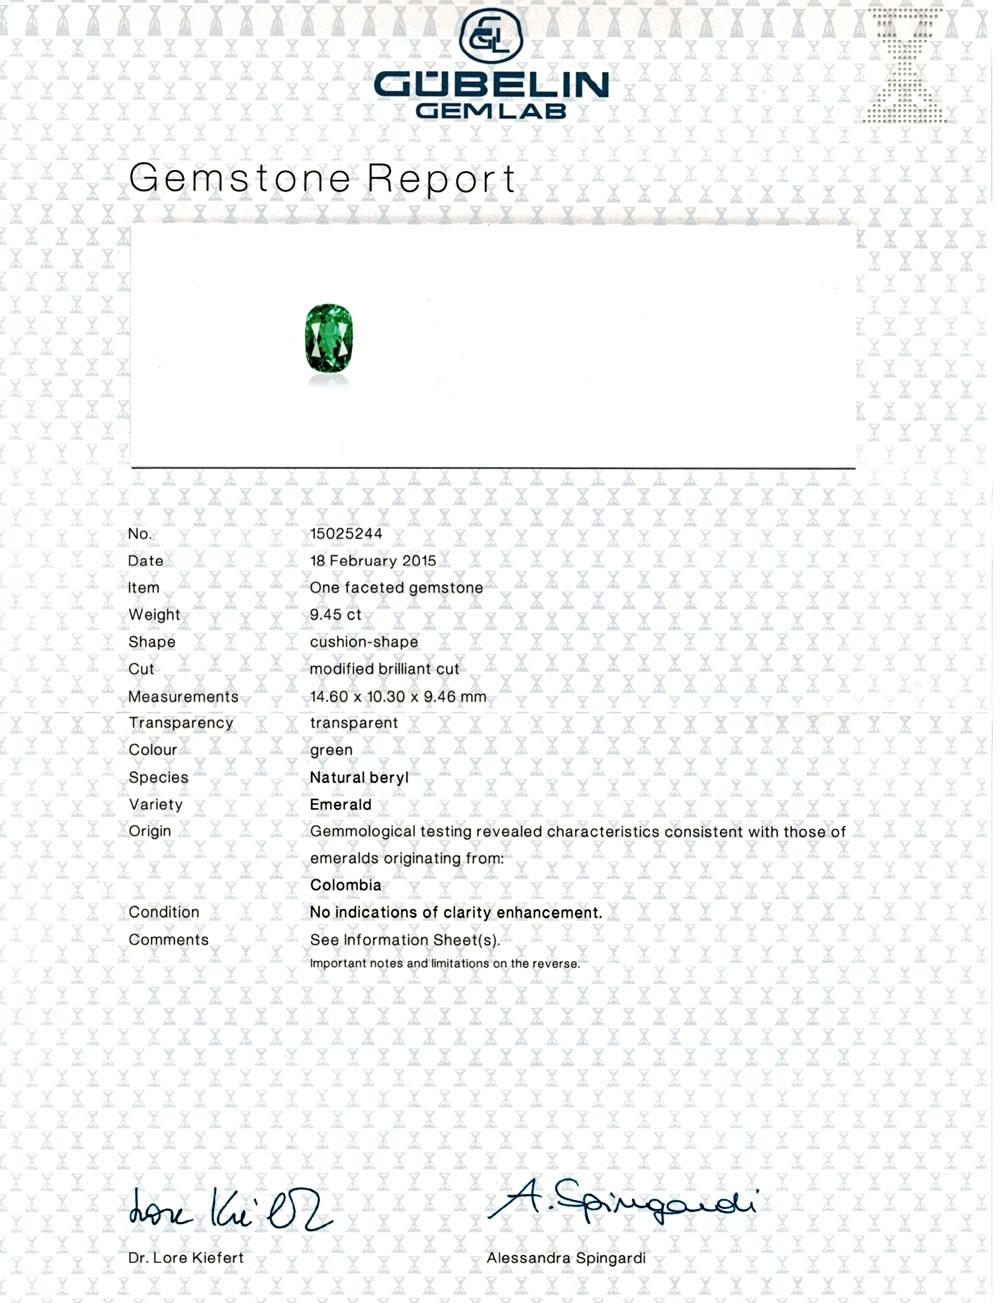 Gubellin Certified Emerald